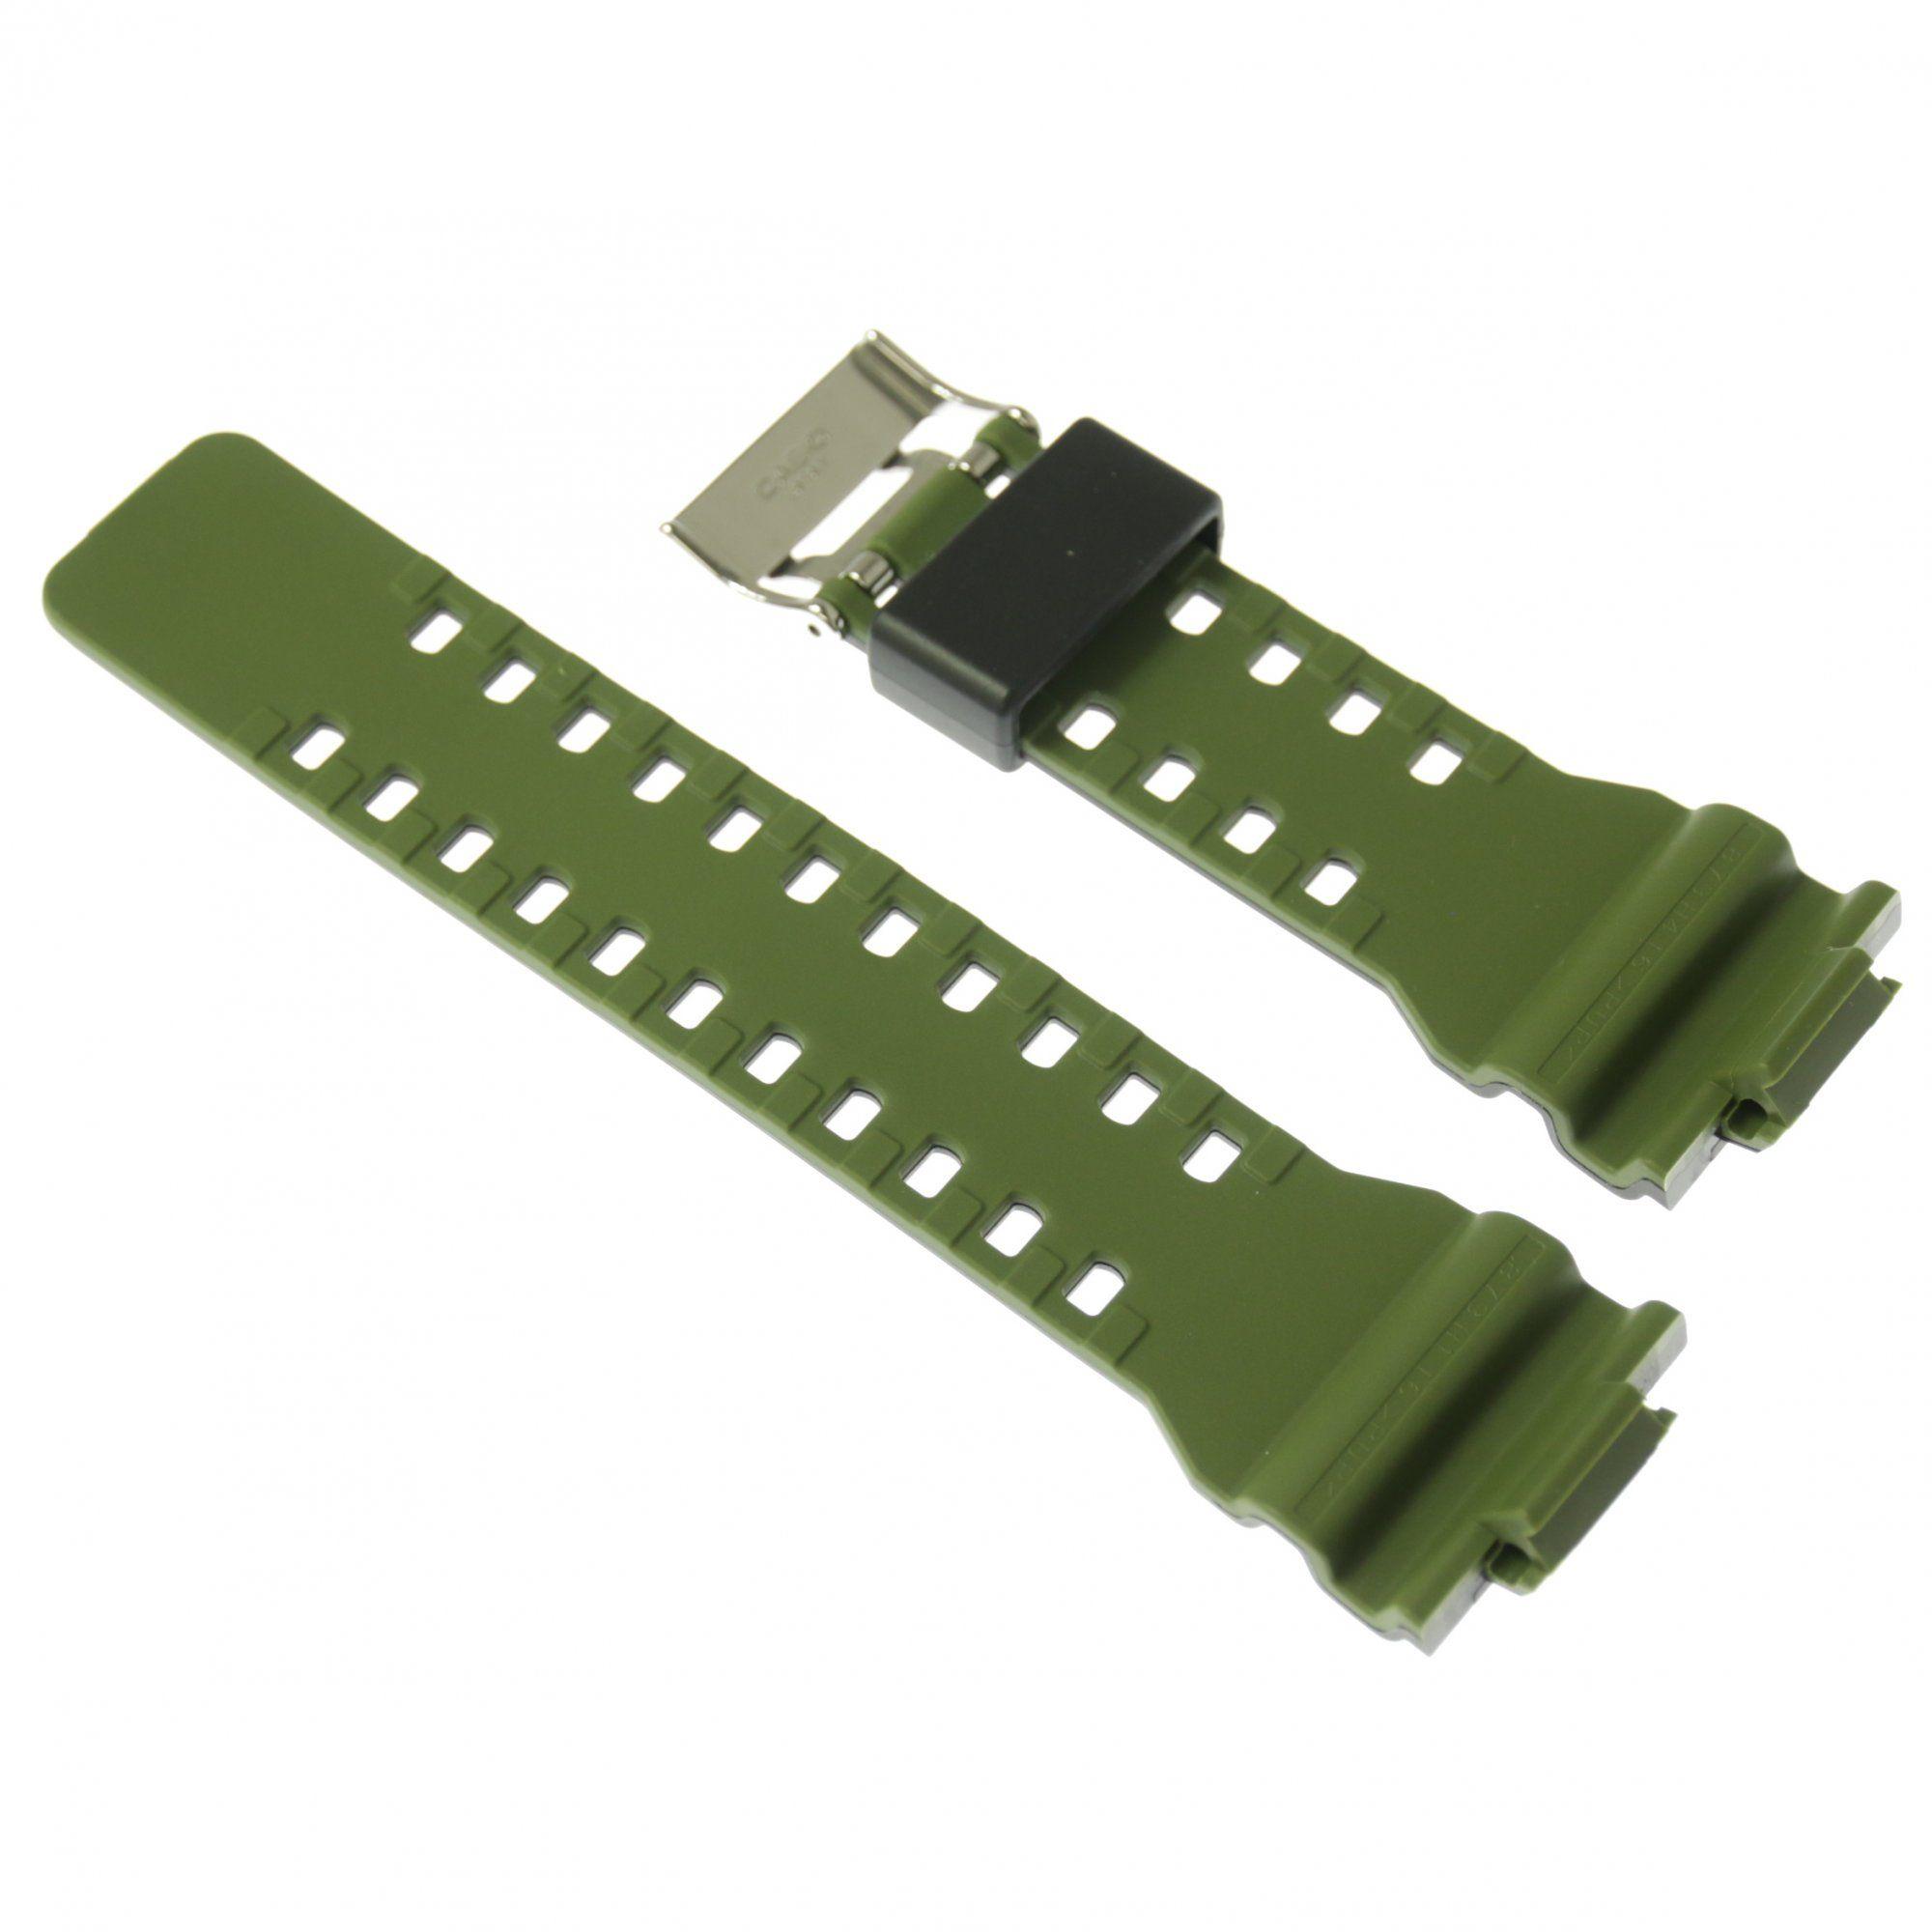 Pulseira Casio G-shock Ga-100L-1A Resina Preto e Verde  - E-Presentes